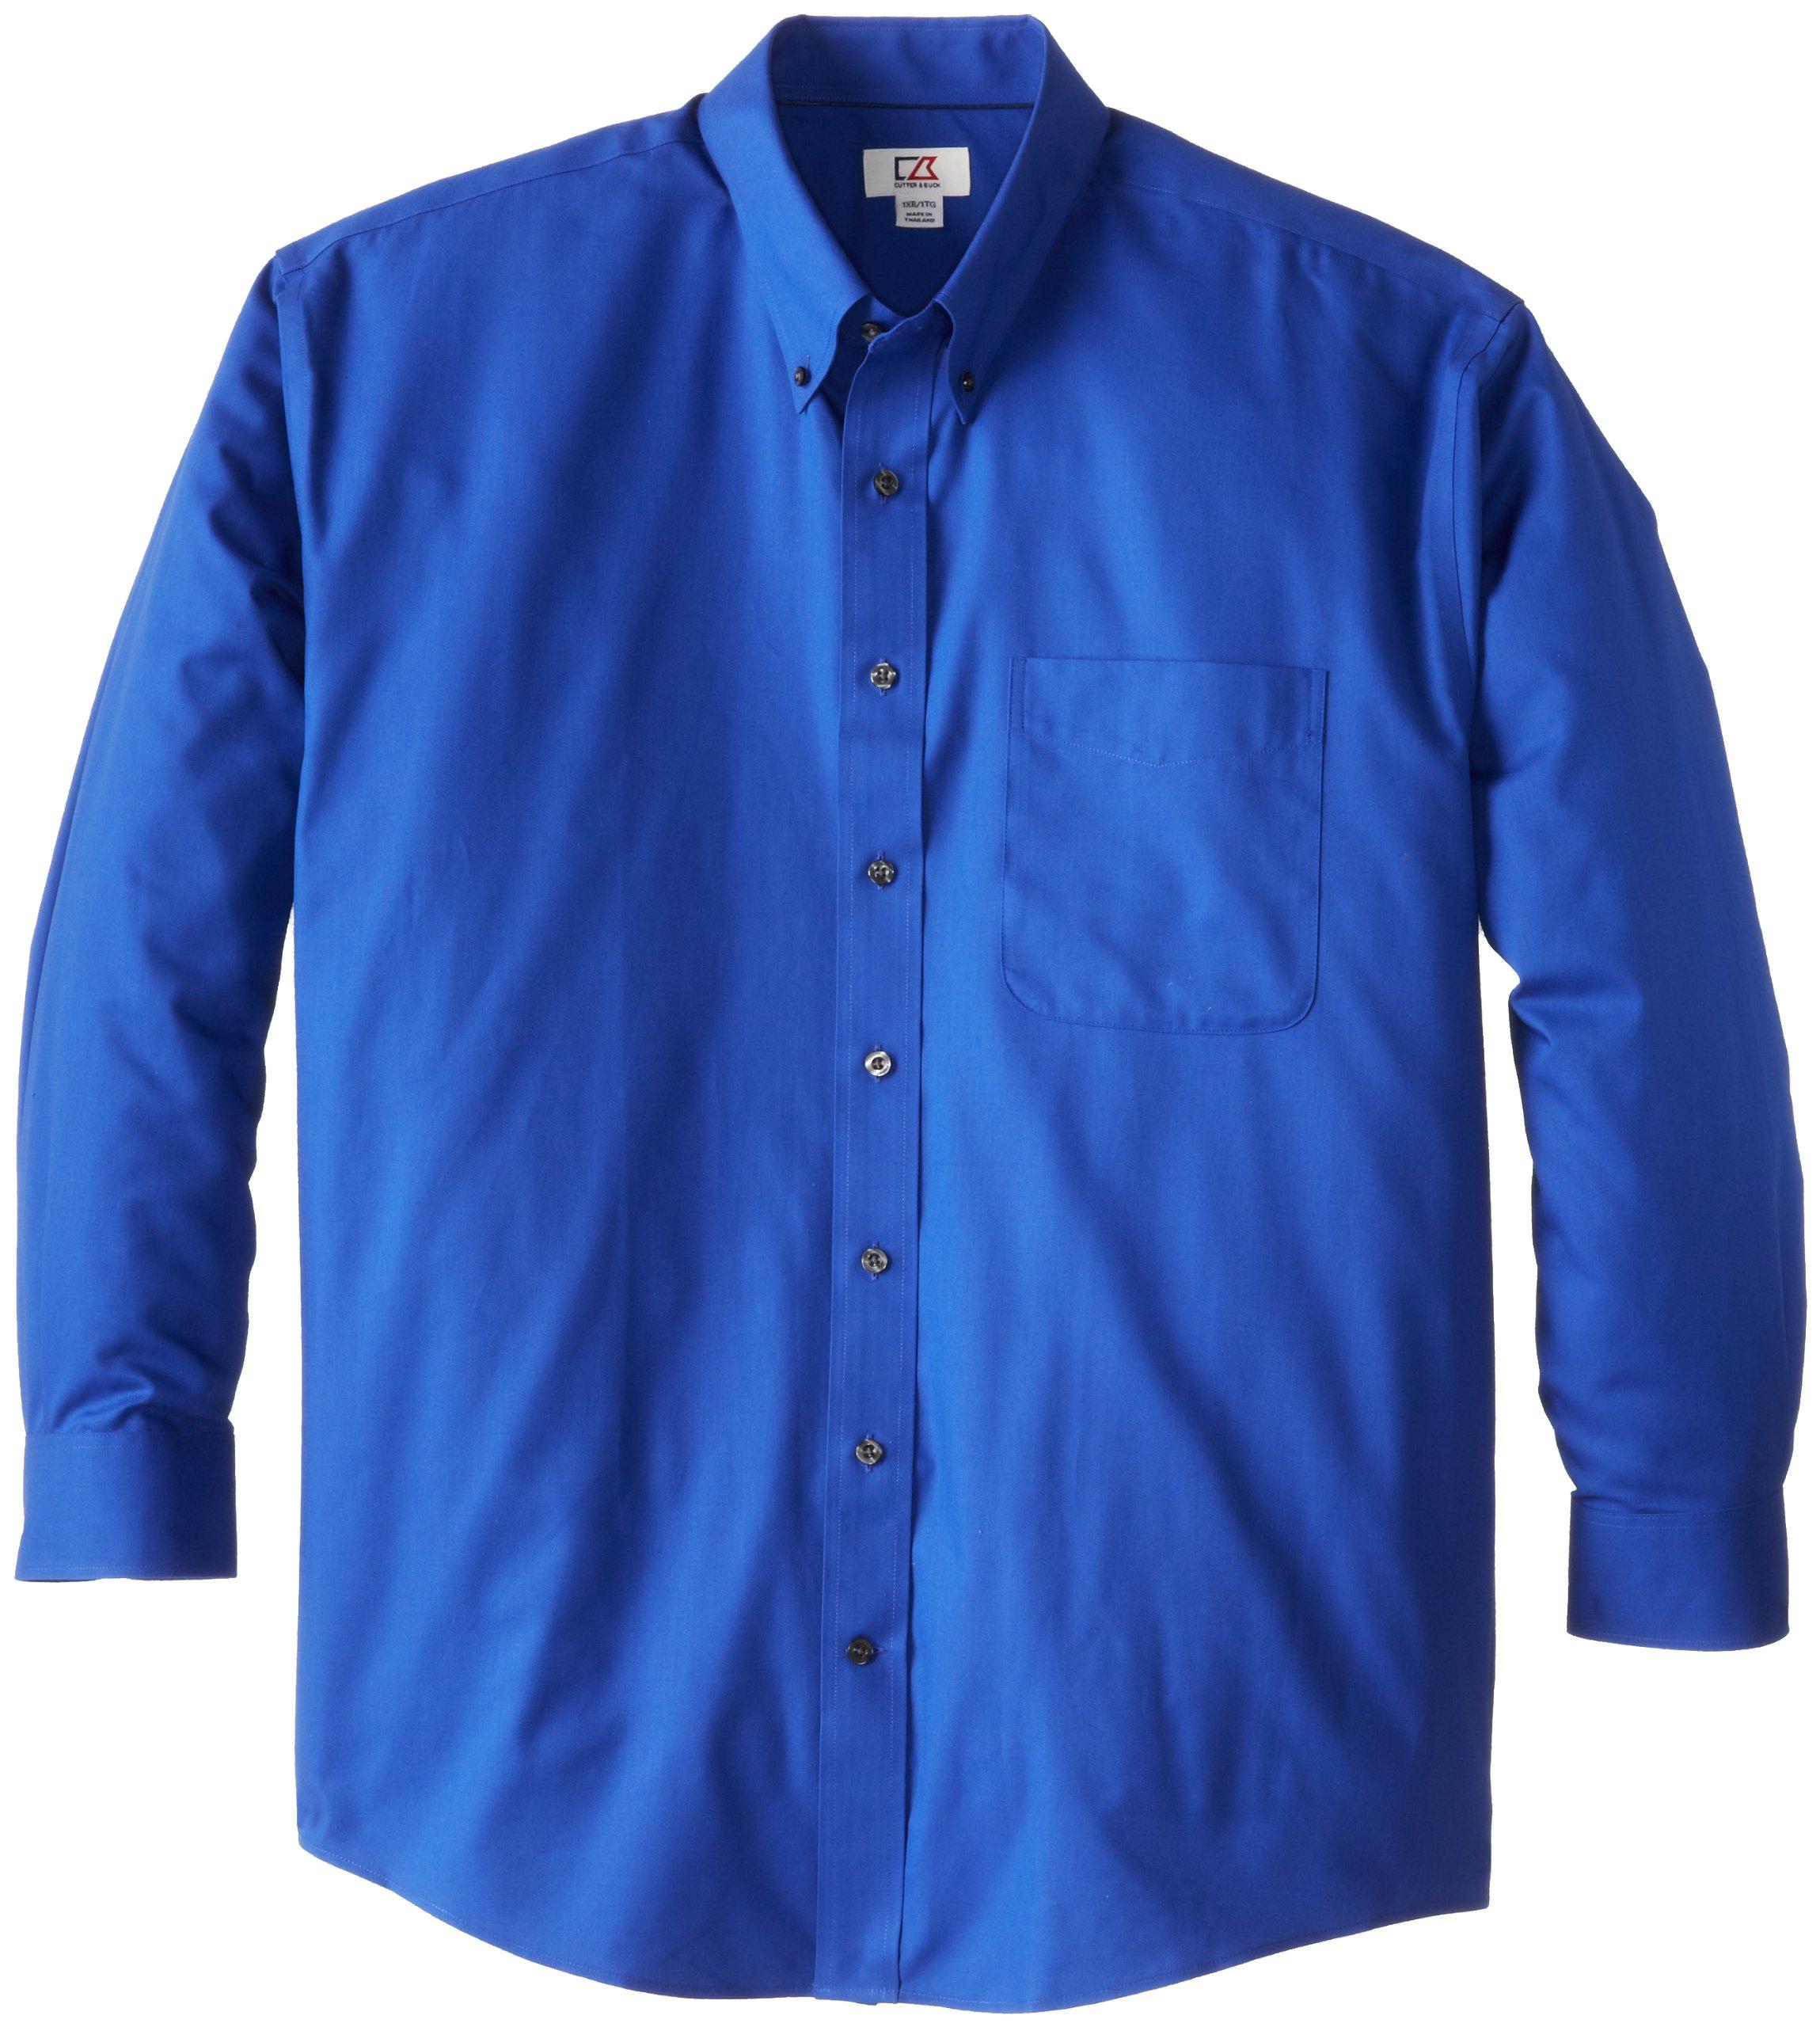 Cutter & Buck Men's Big-Tall Epic Easy Care Fine Twill Shirt, French Blue, 4XT